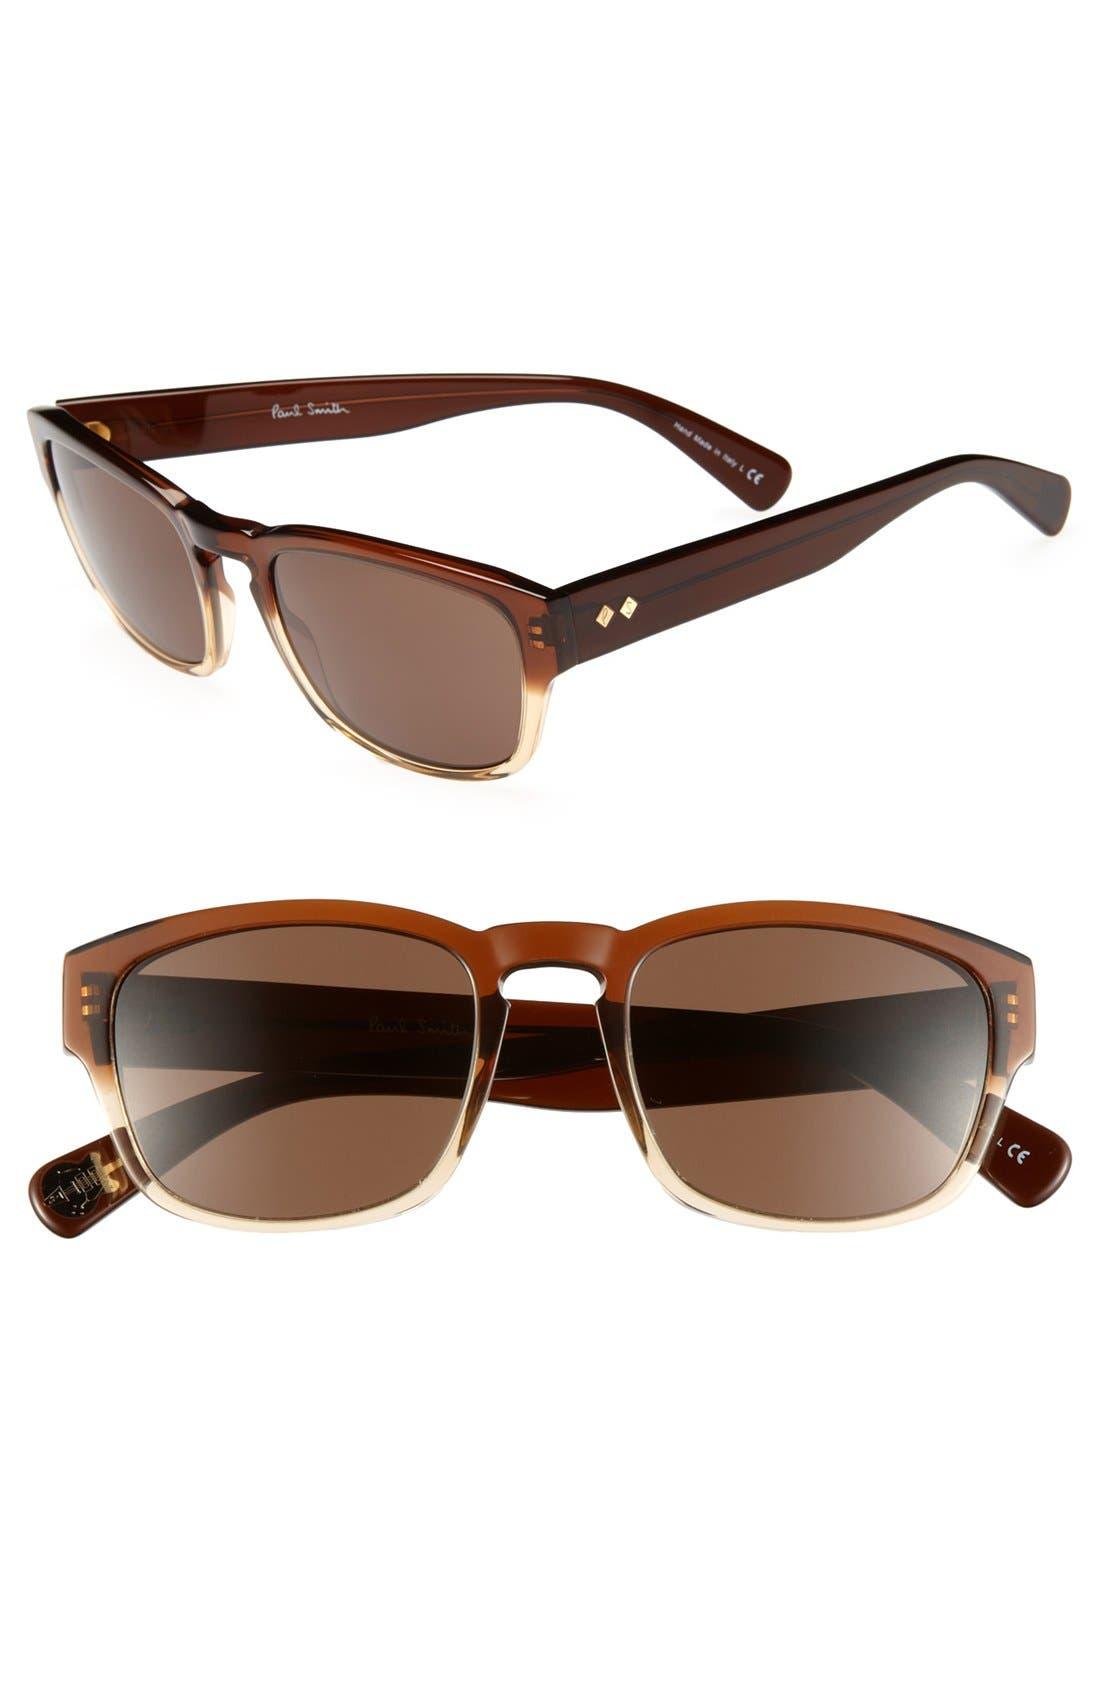 Alternate Image 1 Selected - Paul Smith 'Berling' 54mm Sunglasses